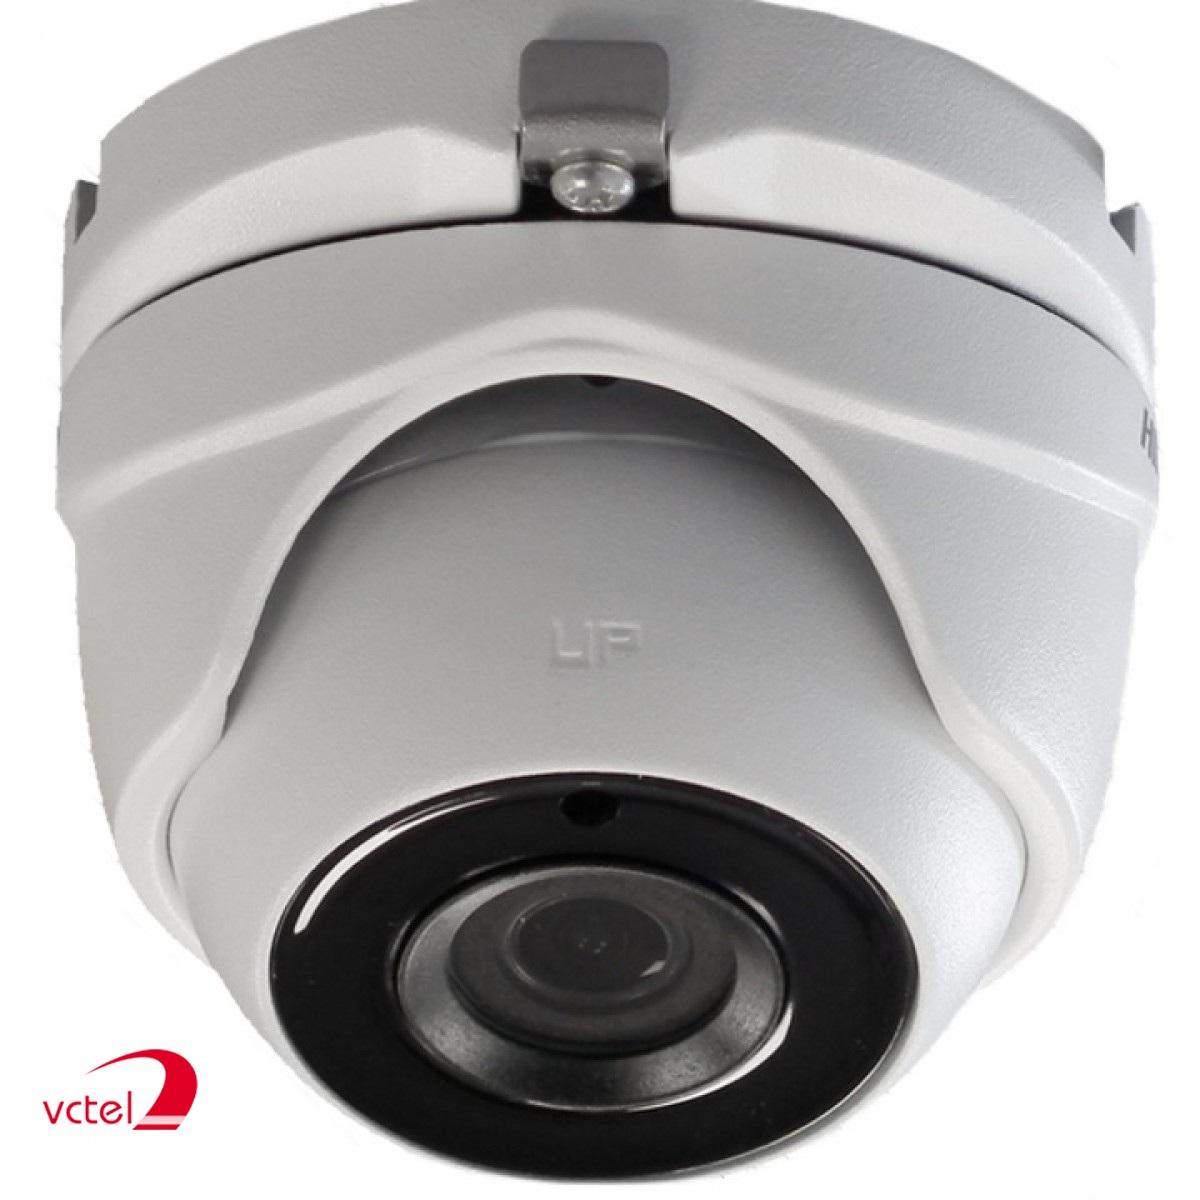 Camera Hikvision DS-2CE56D7T-ITM bảo hành 12 tháng vctel